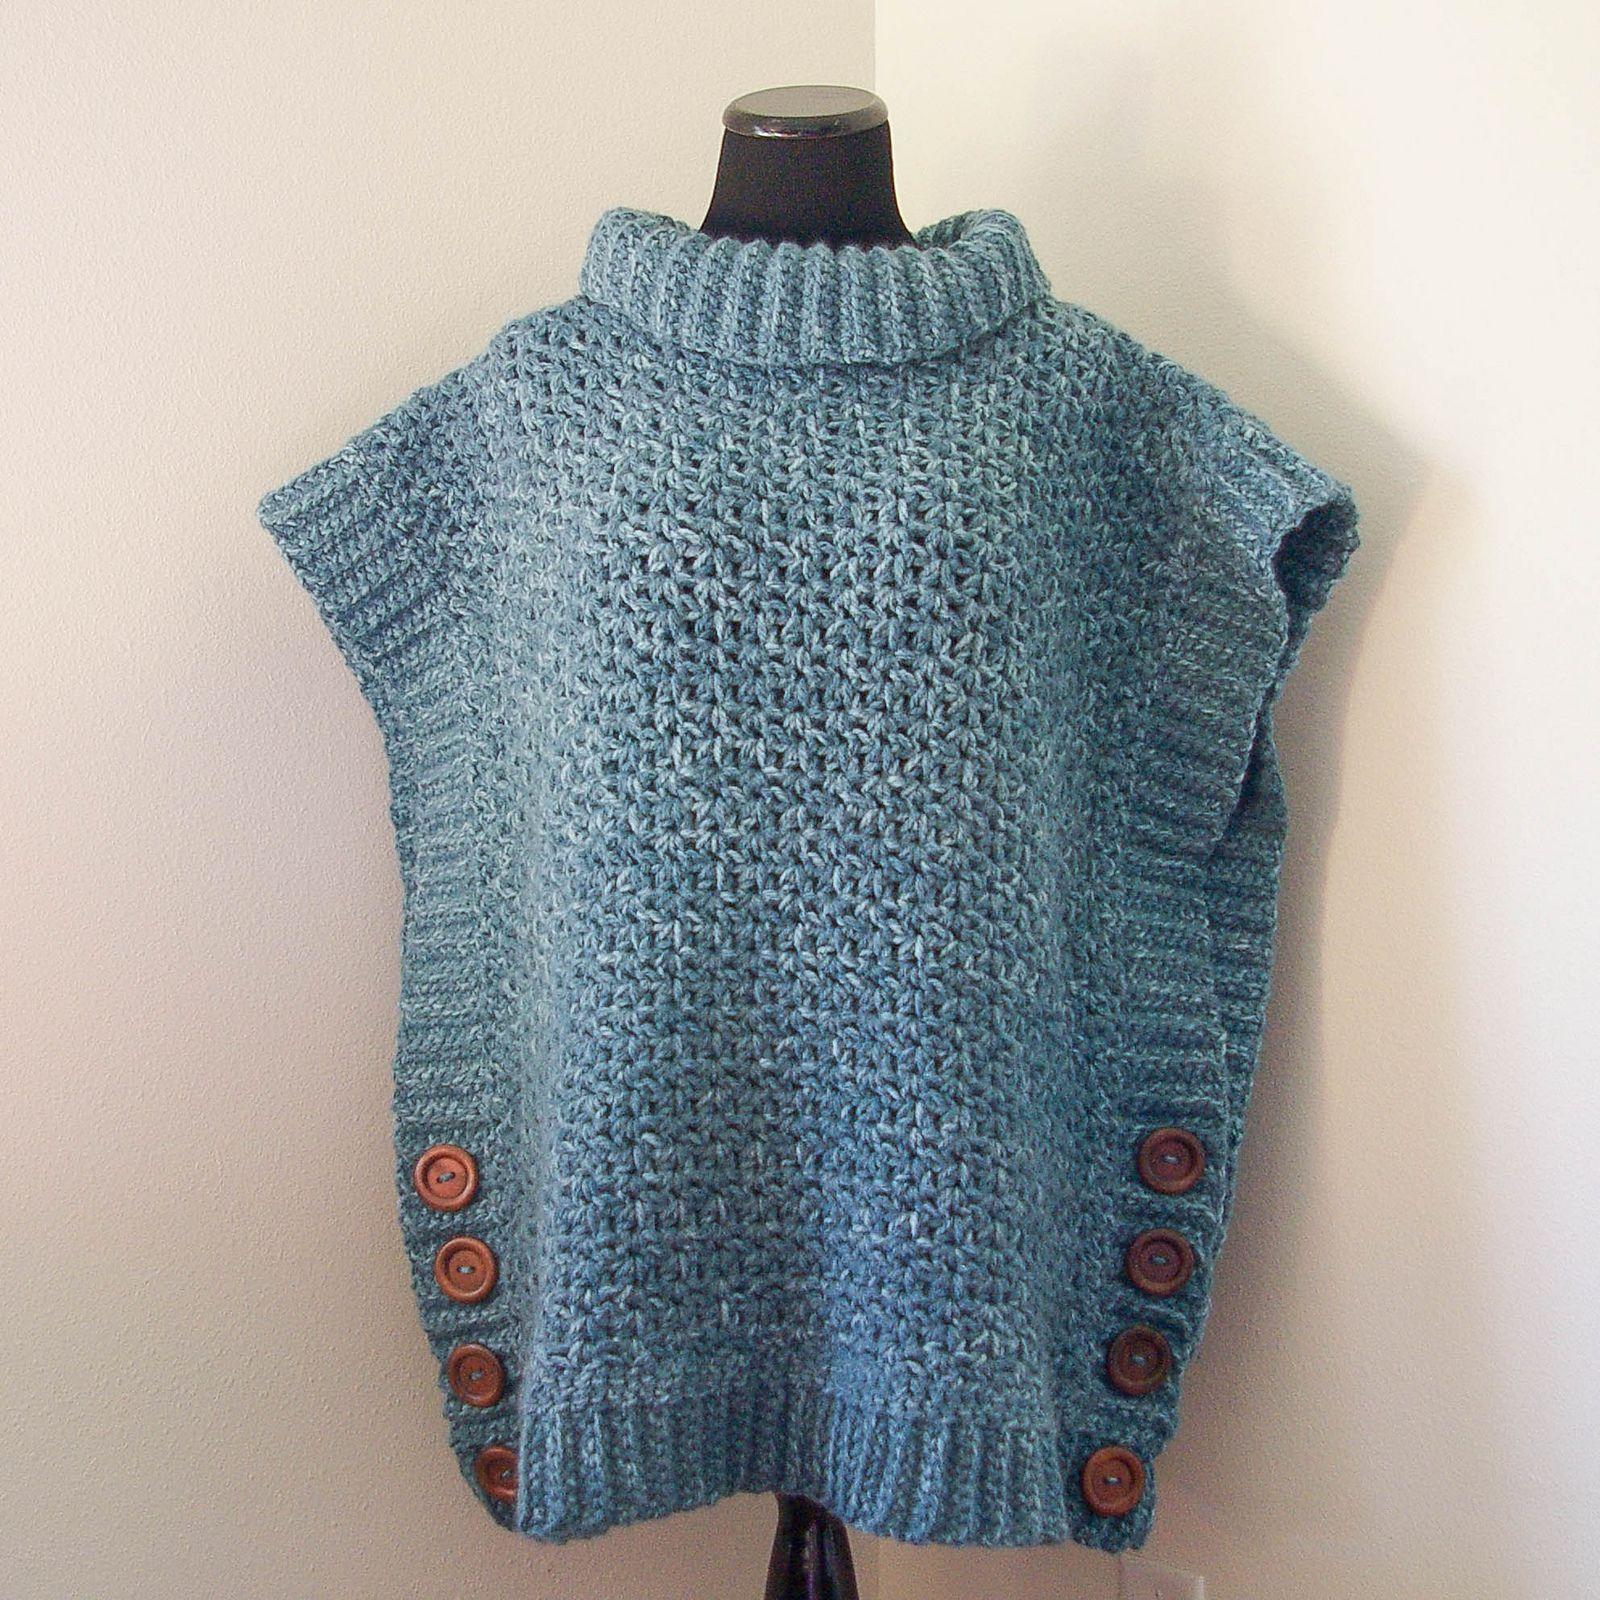 Ravelry: Amelia Poncho Adult Sweater by Megan Meyer | Crochet ...